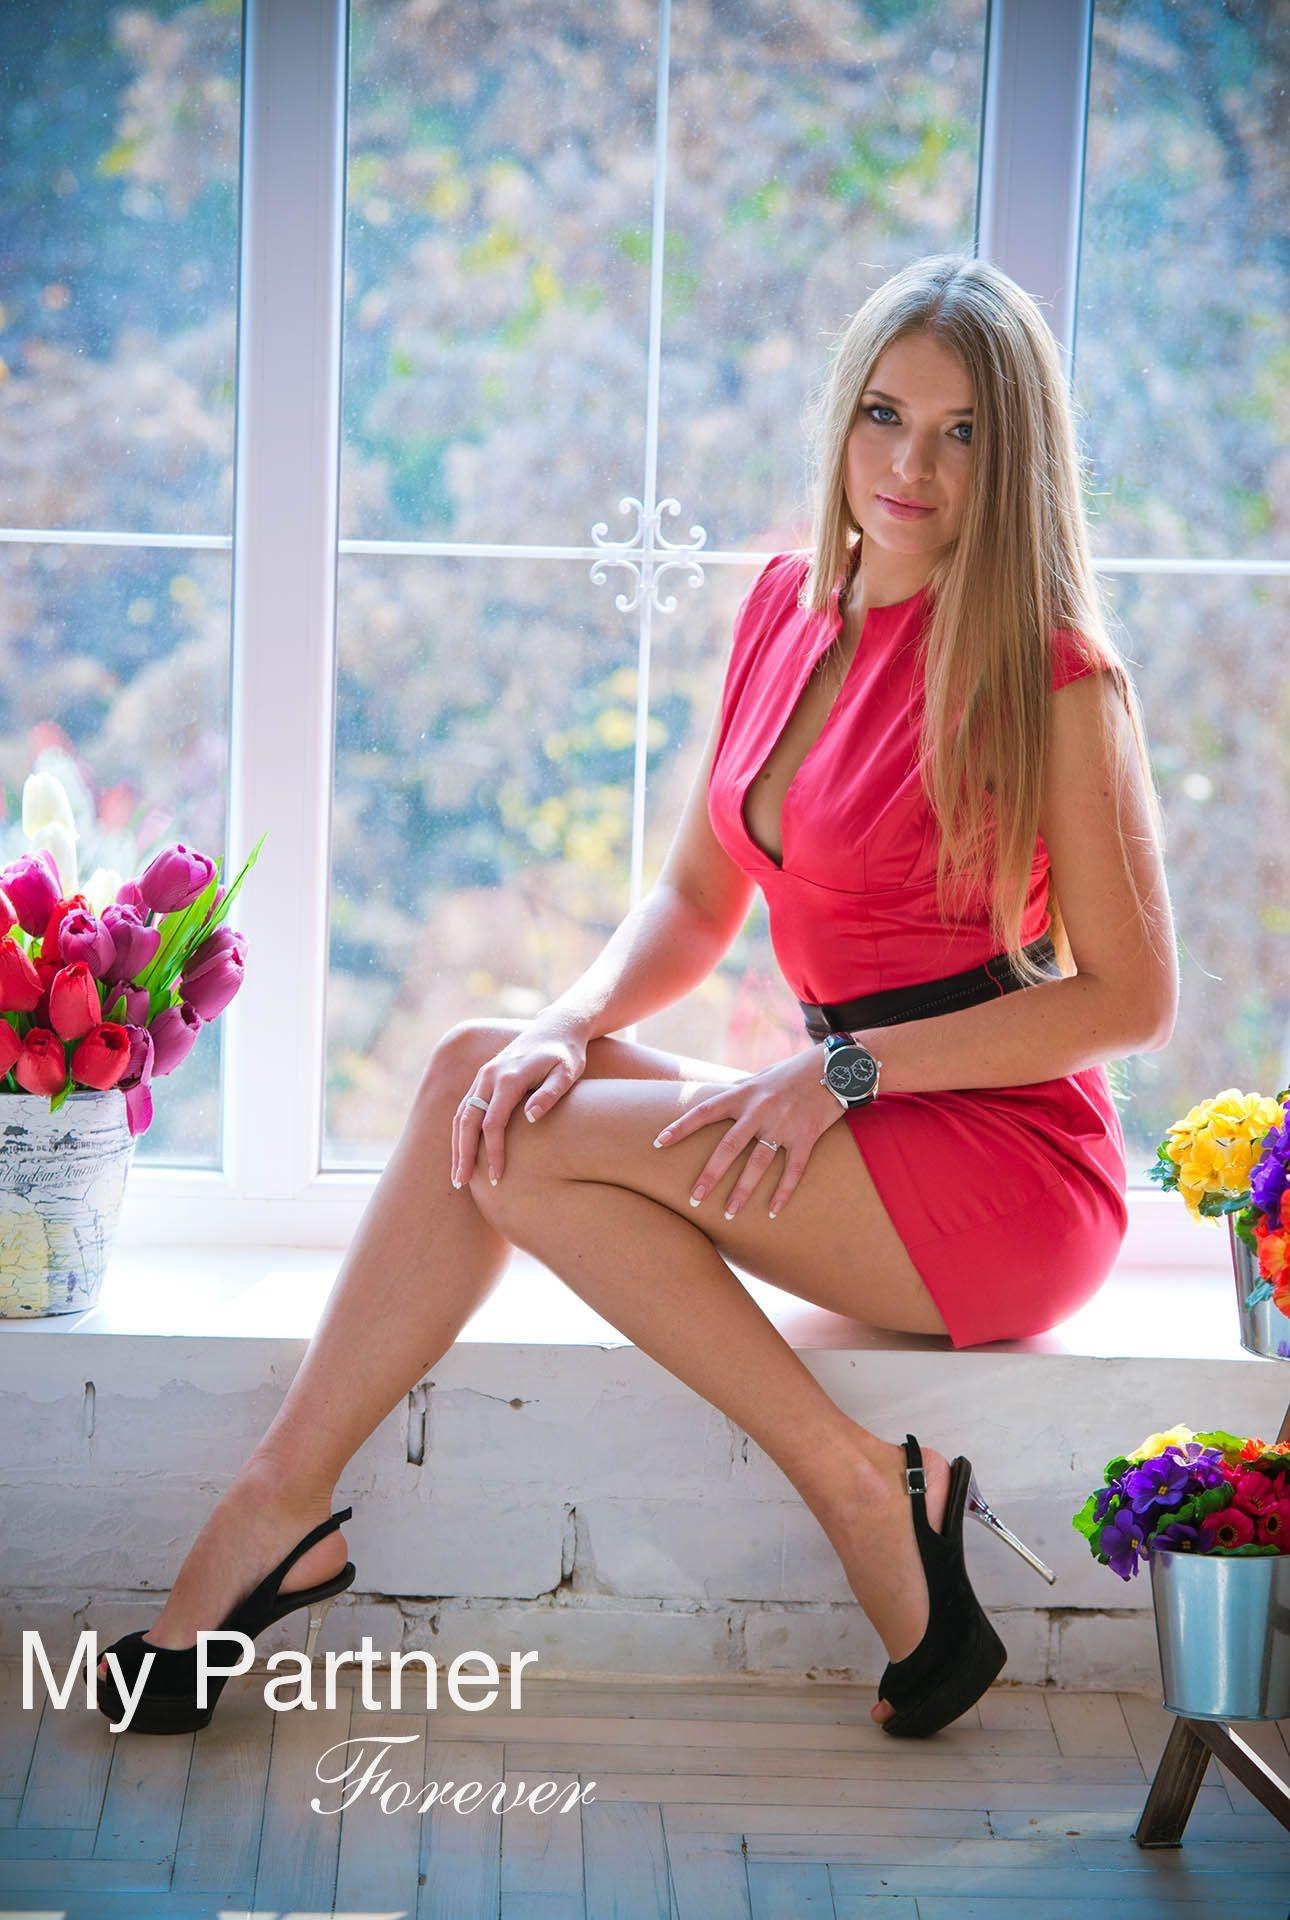 Dating Site to Meet Sexy Ukrainian Girl Nadezhda from Zaporozhye, Ukraine